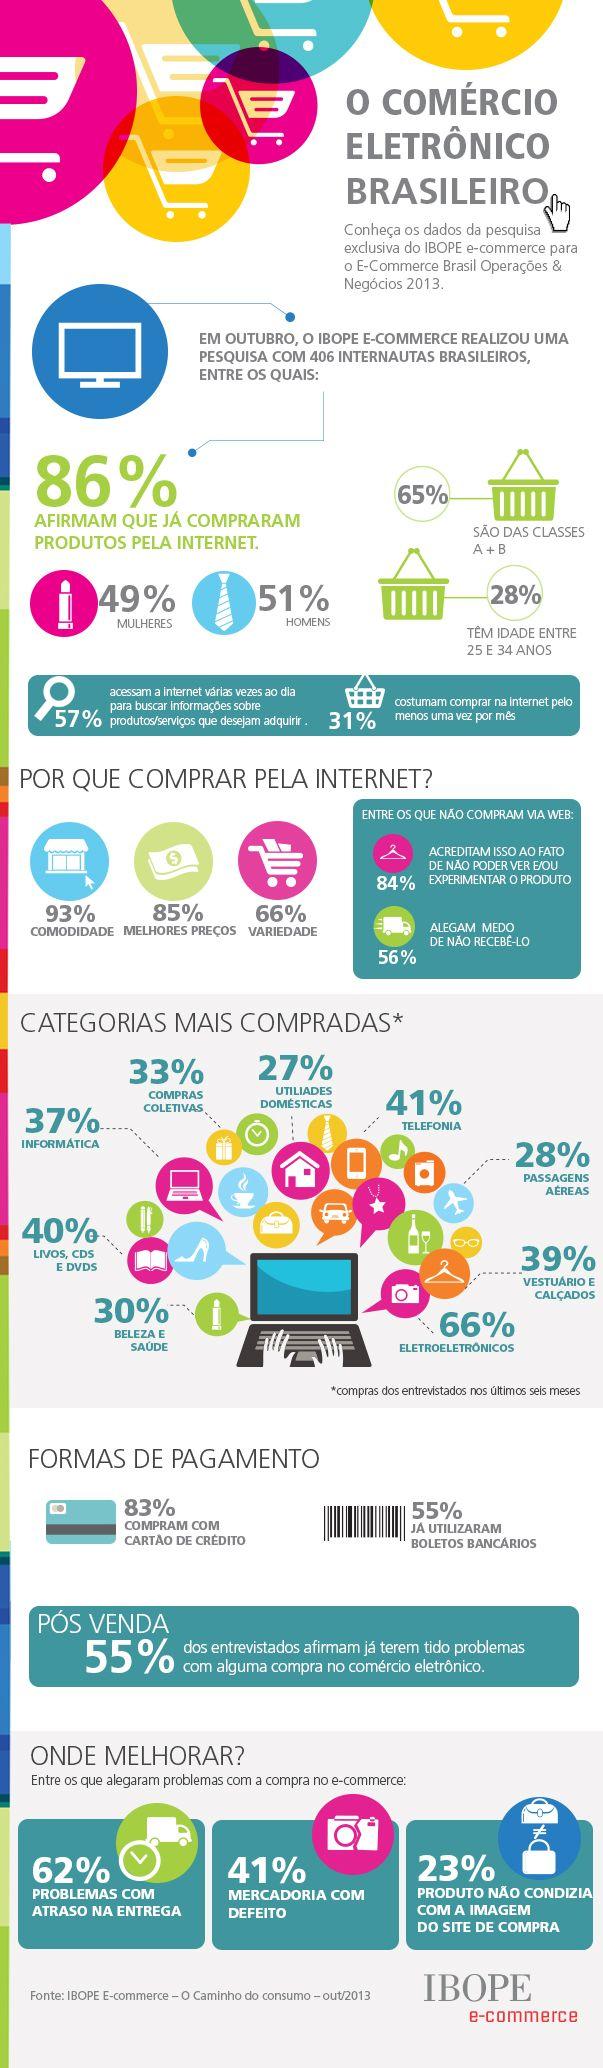 infografico-o-comércio-eletronico-brasileiro-ibope